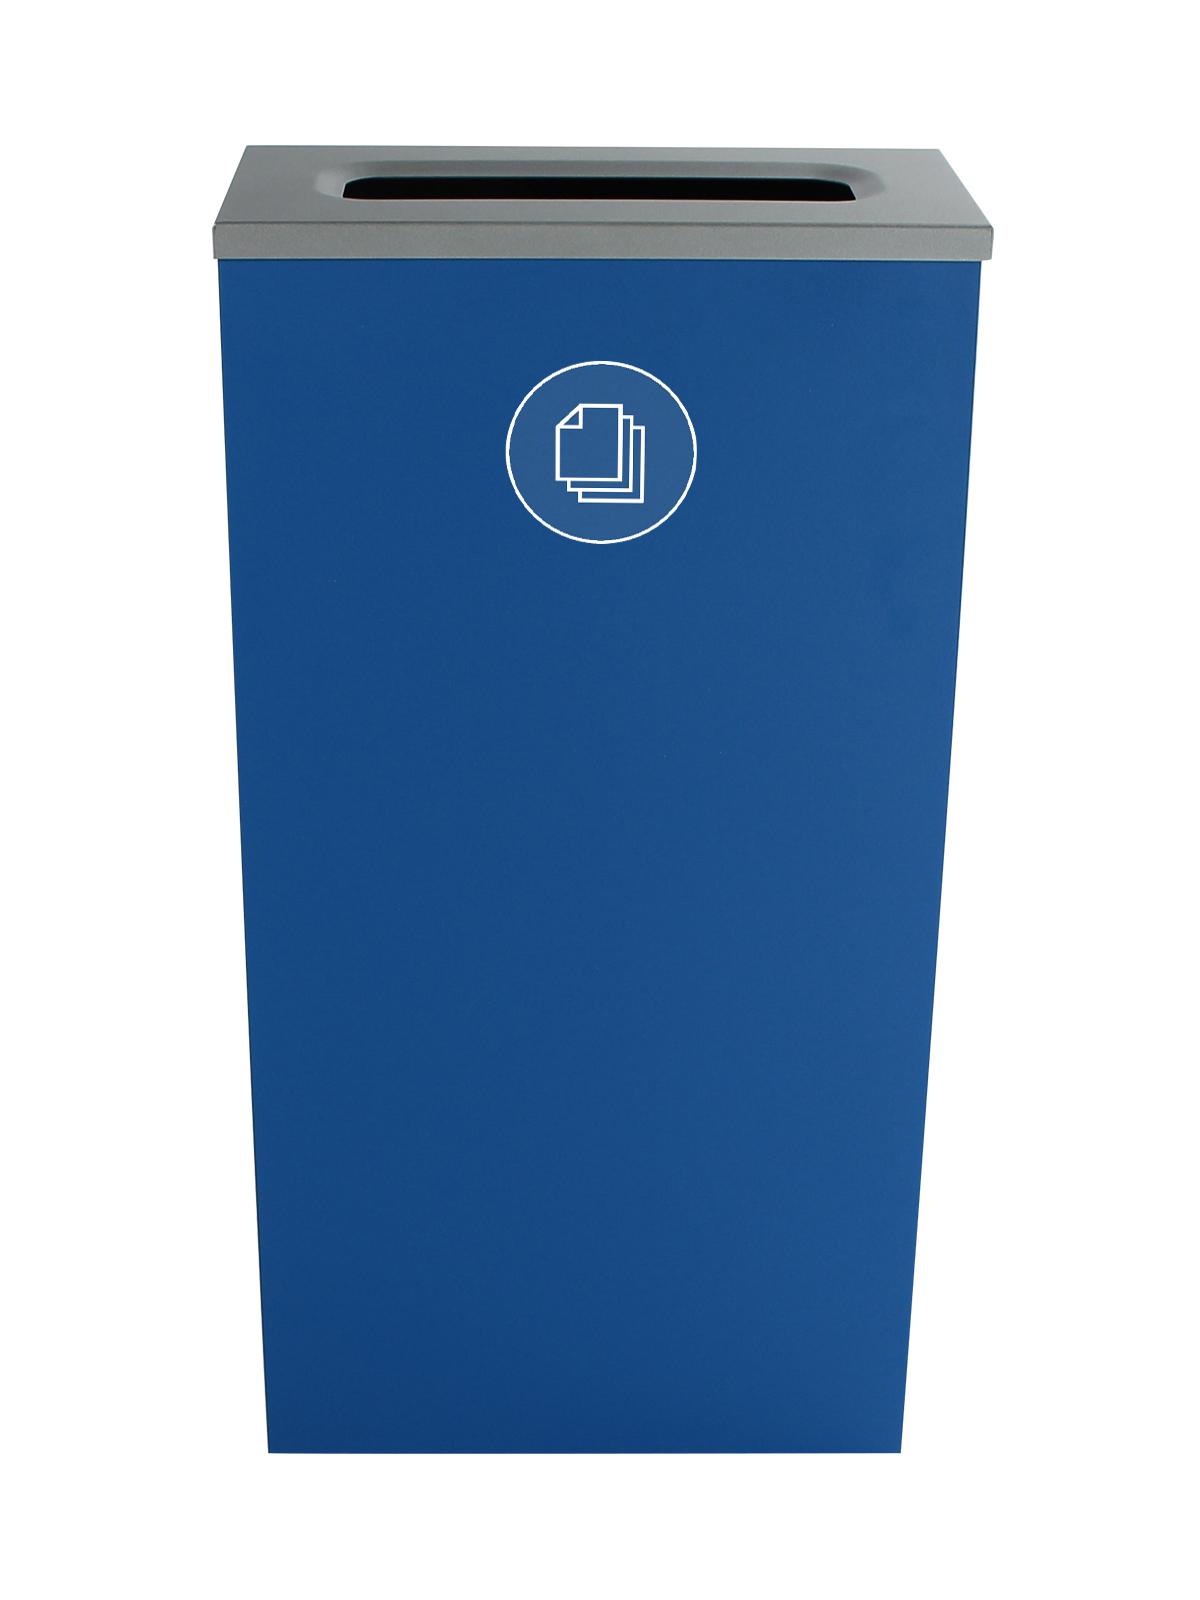 SPECTRUM - Single - Cube Slim - Paper - Slot - Blue